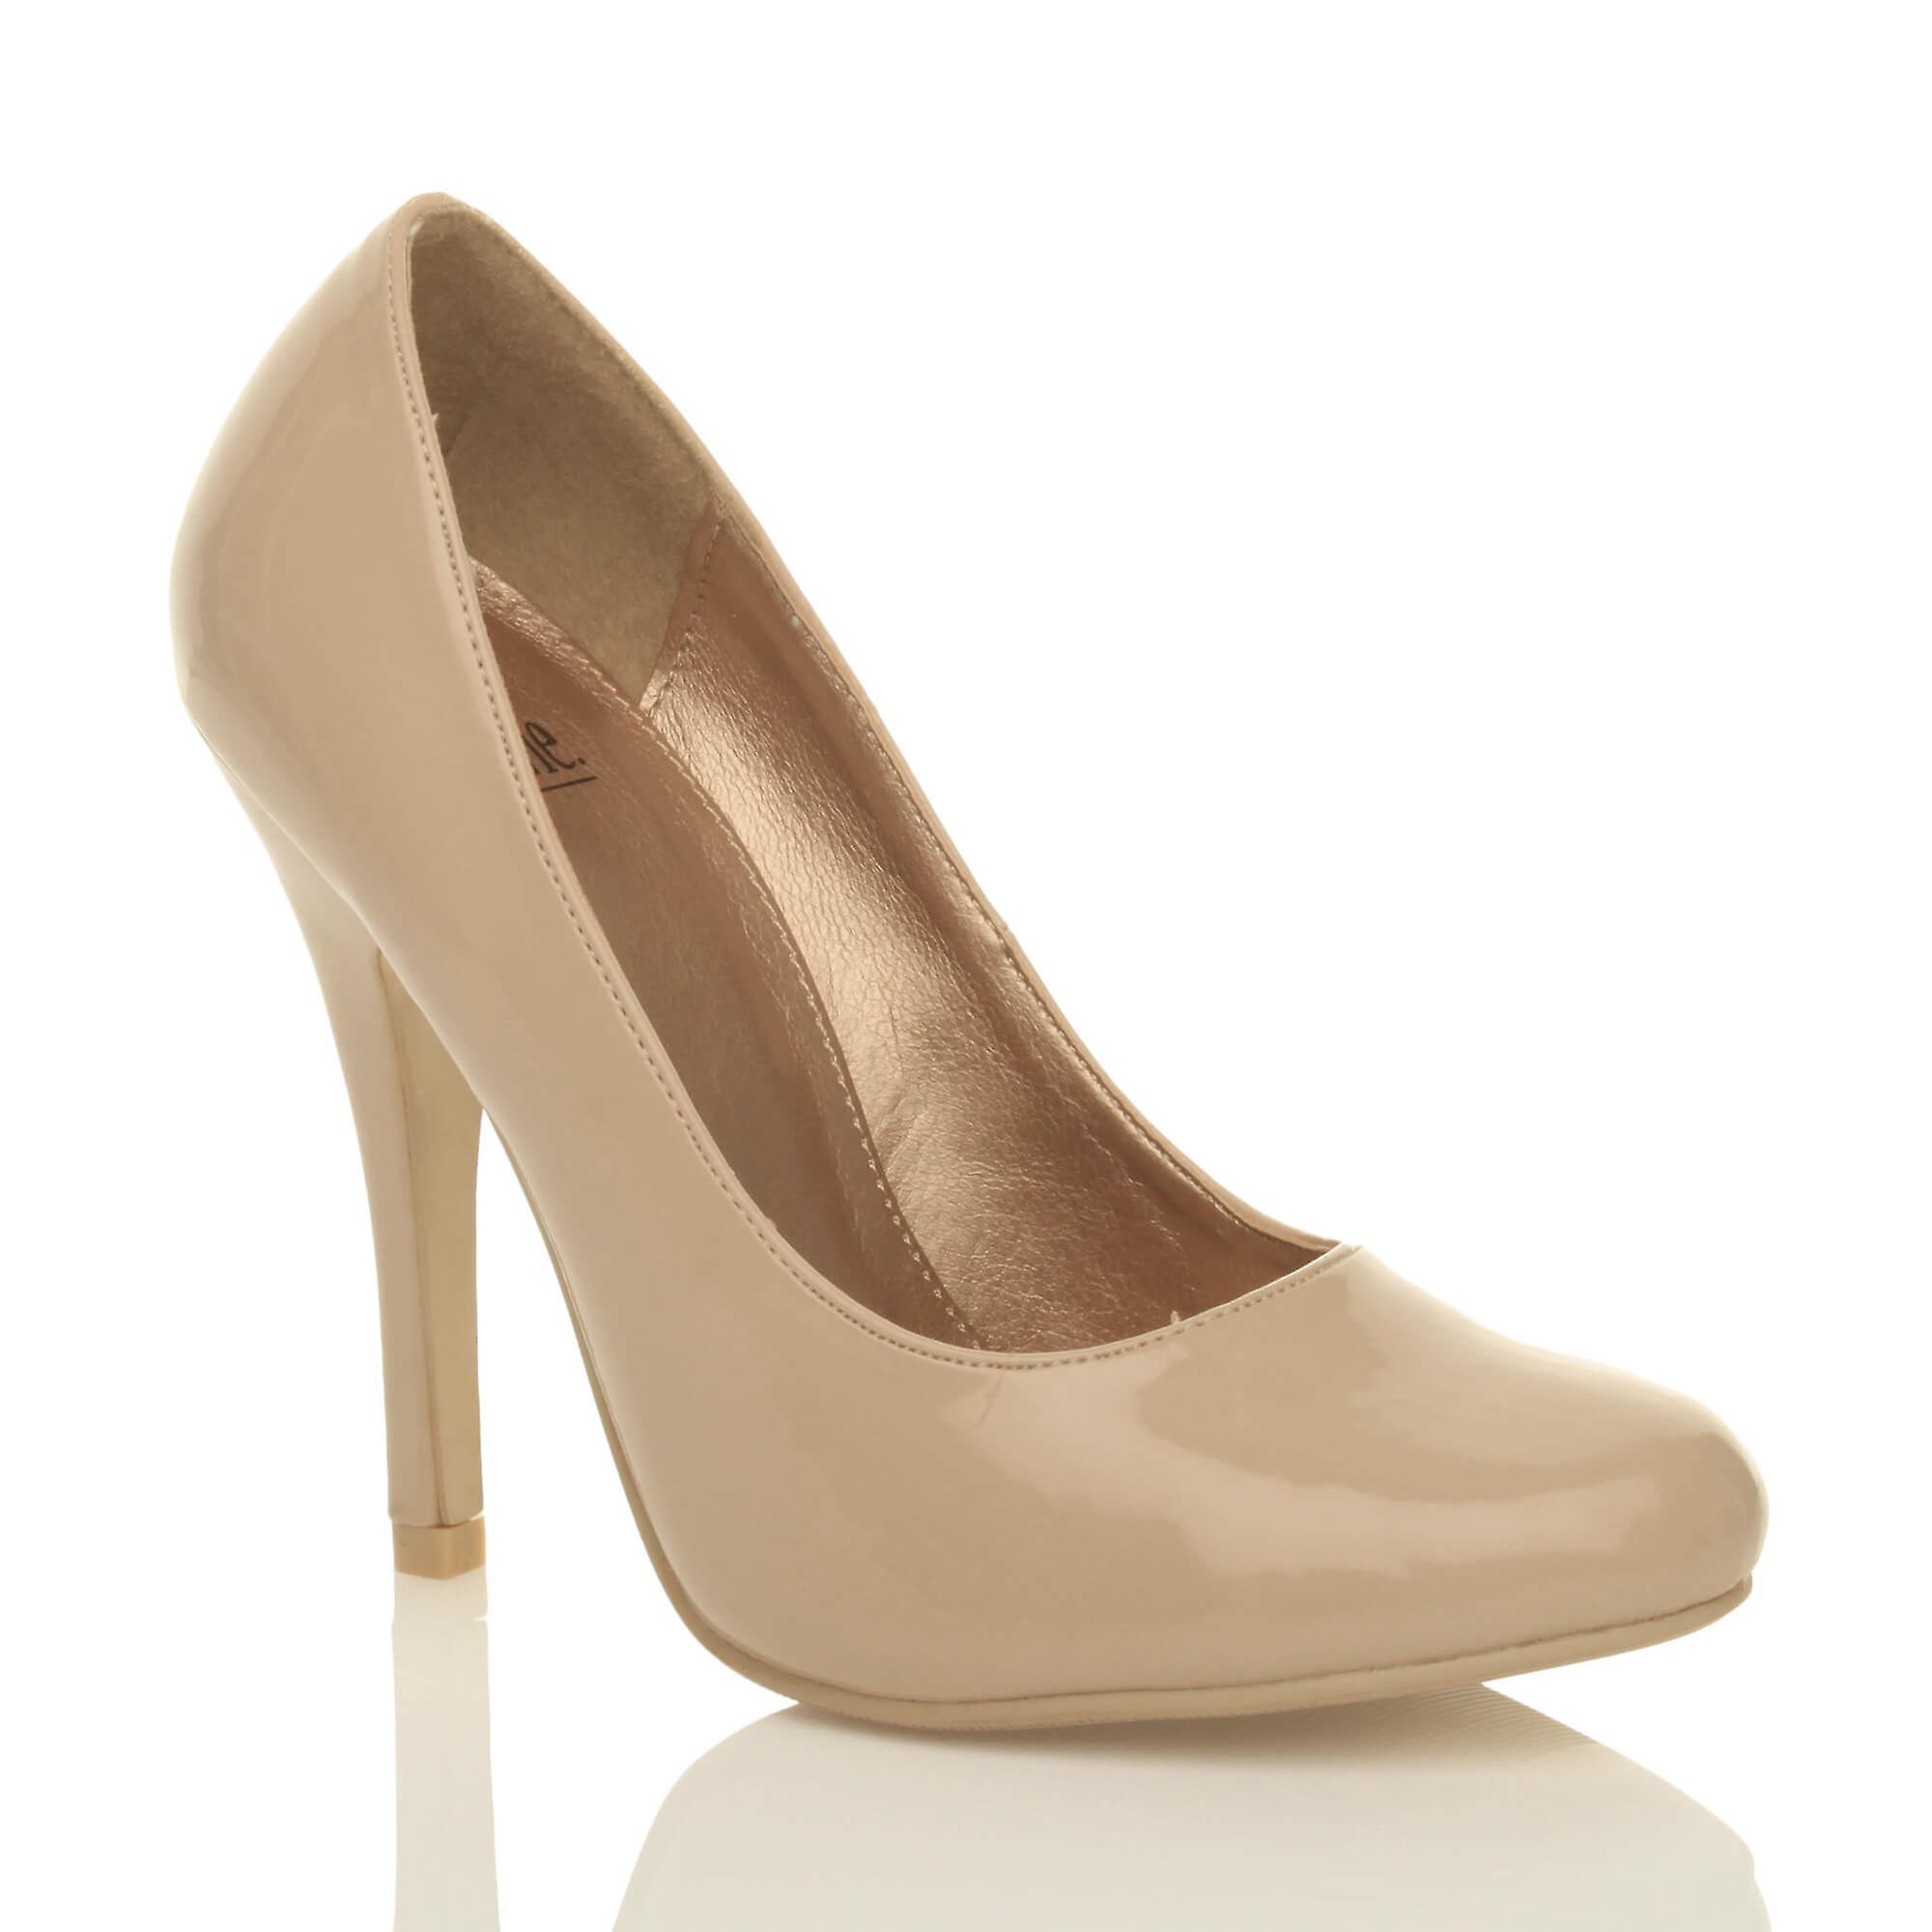 Ajvani womens high heel classic basic work evening court shoes pumps